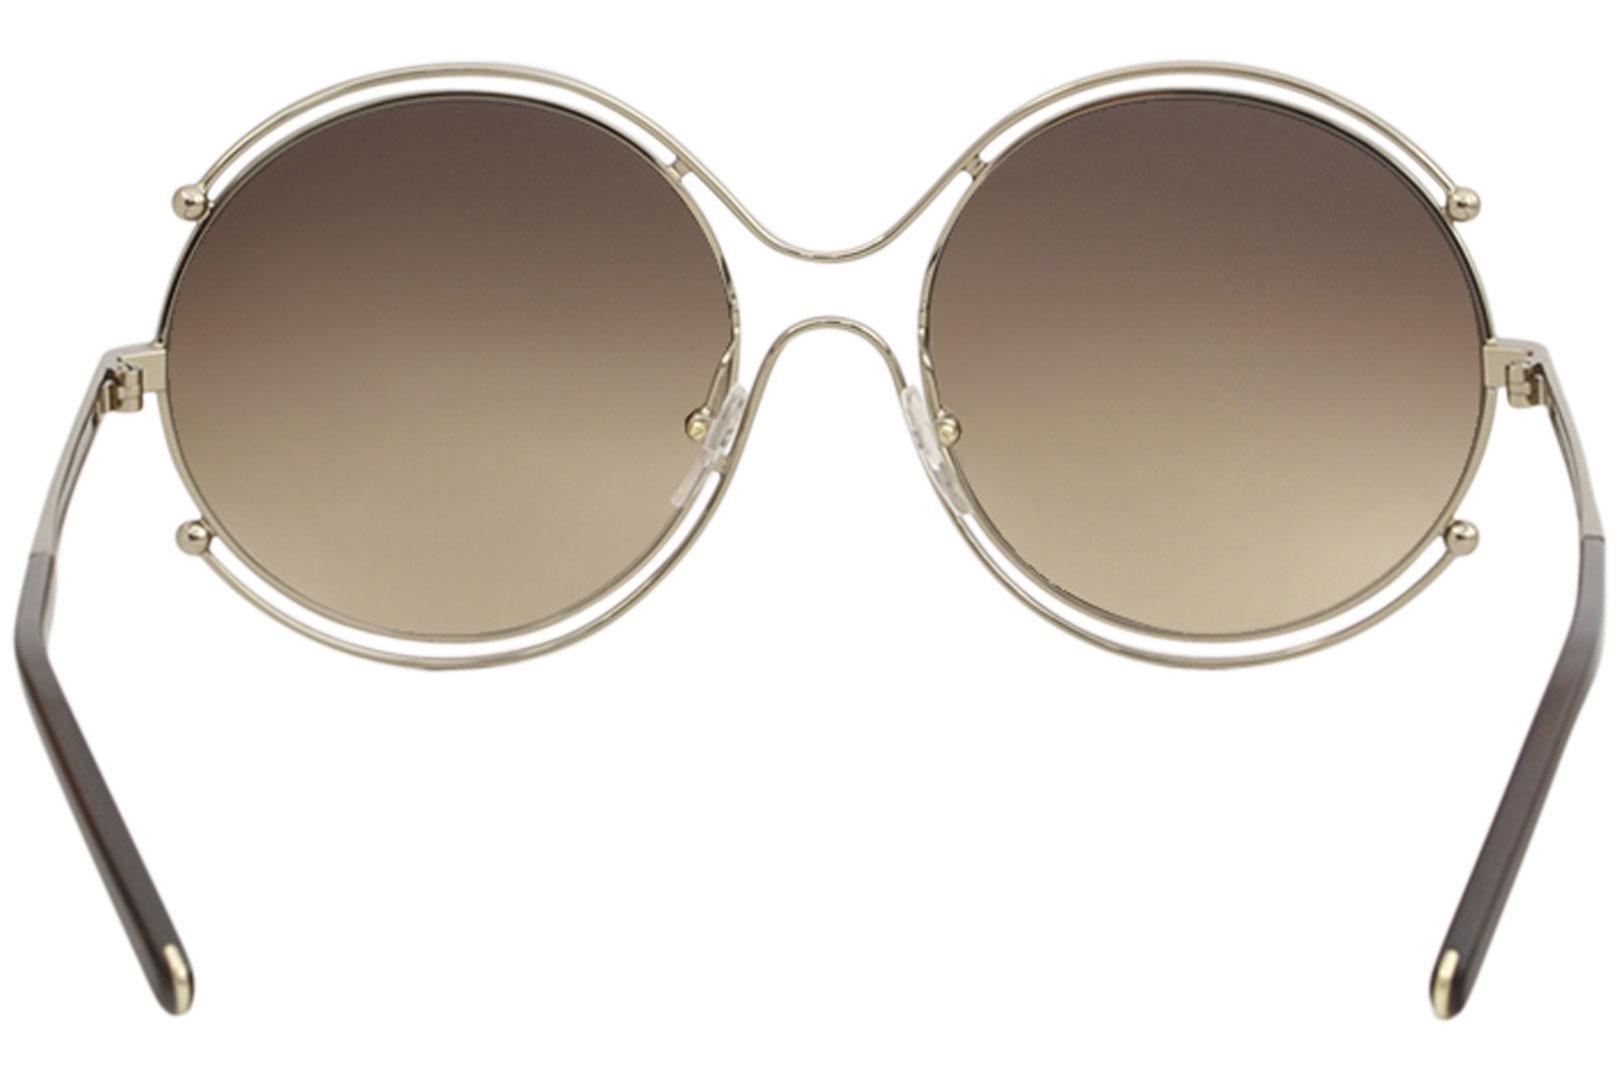 40f8fb9ff0e3 Chloe Women s CE 122S CE122S Fashion Round Sunglasses by Chloe